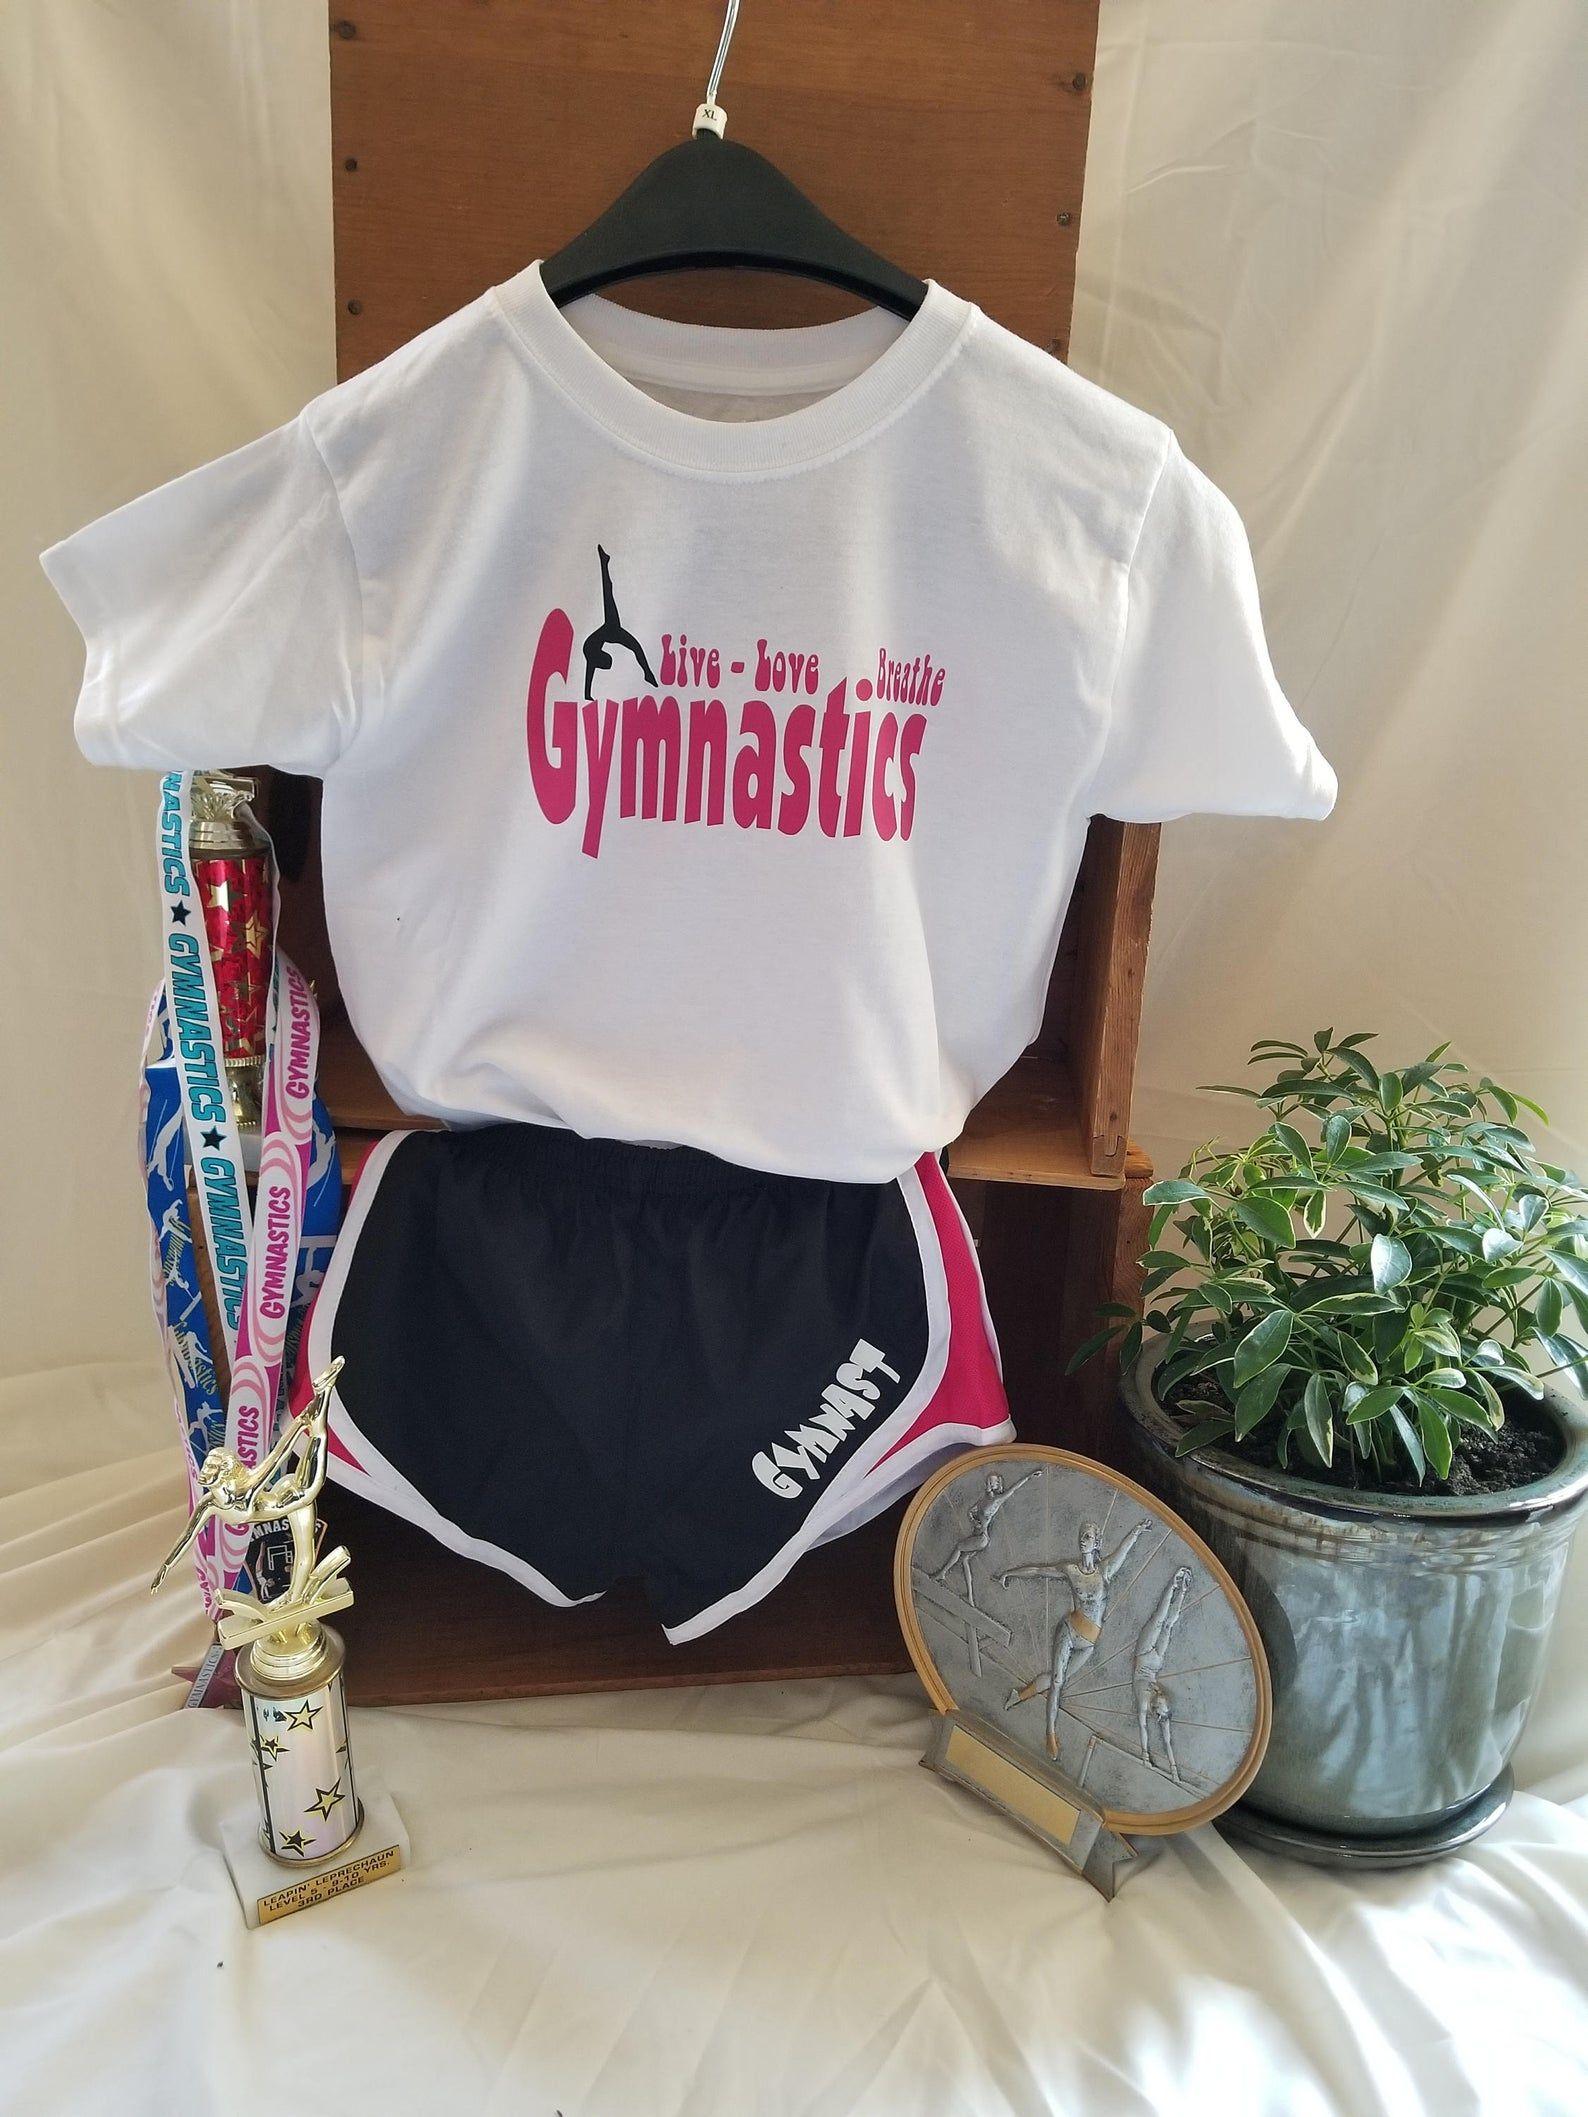 THIS IS MY CARTWHEEL Top  T-SHIRT Gymnastics Acrobat Funny Dance Leotard Gymnast